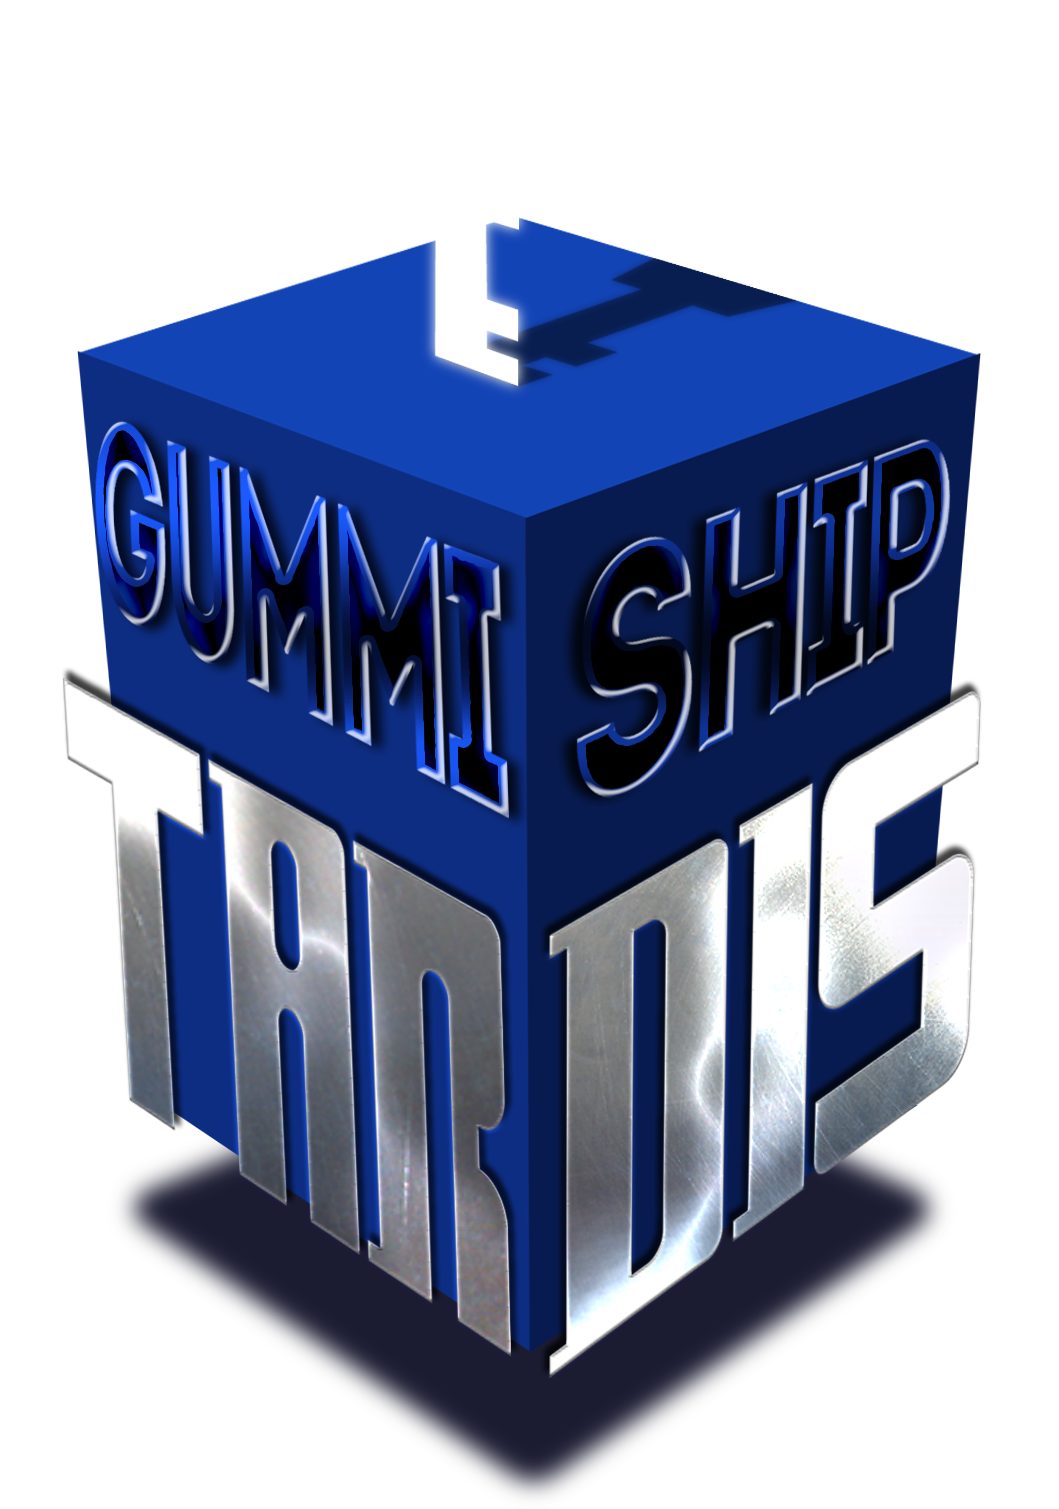 Gummi Ship -TARDIS